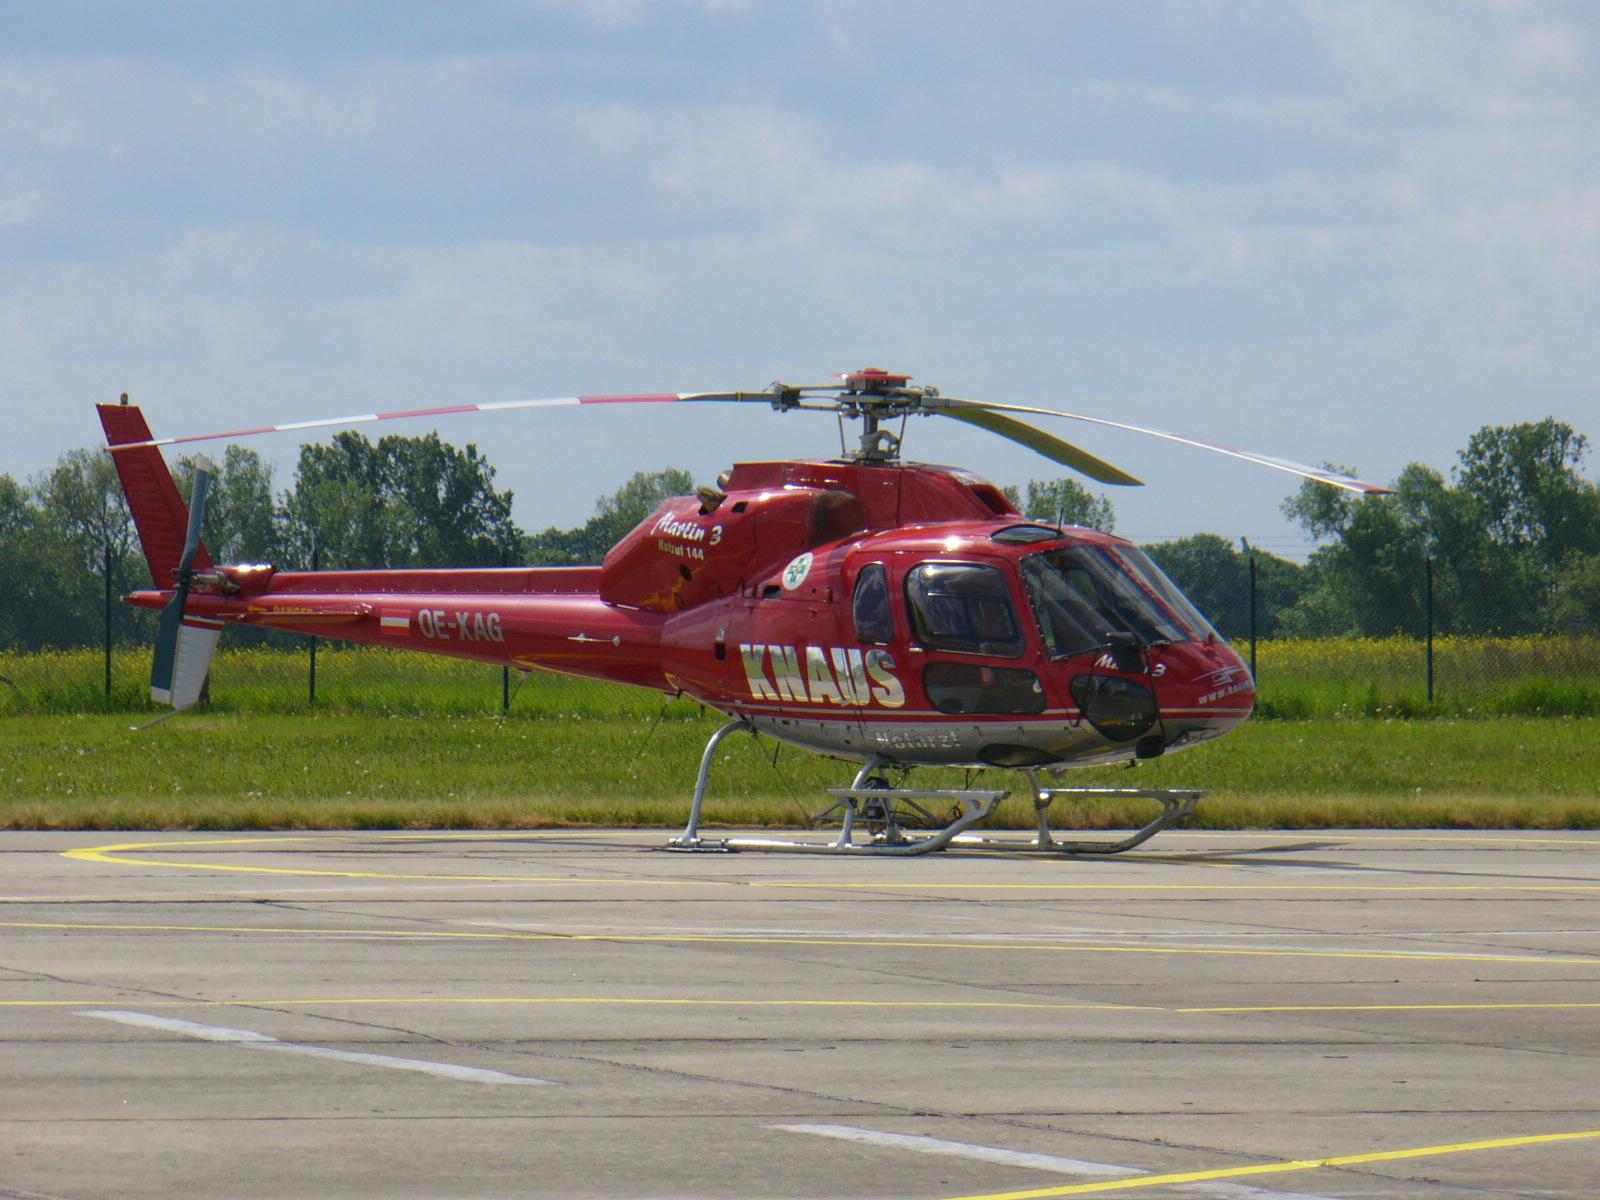 Elicottero 350 : File:eurocopteras350Écureuil ila2006.jpg wikimedia commons